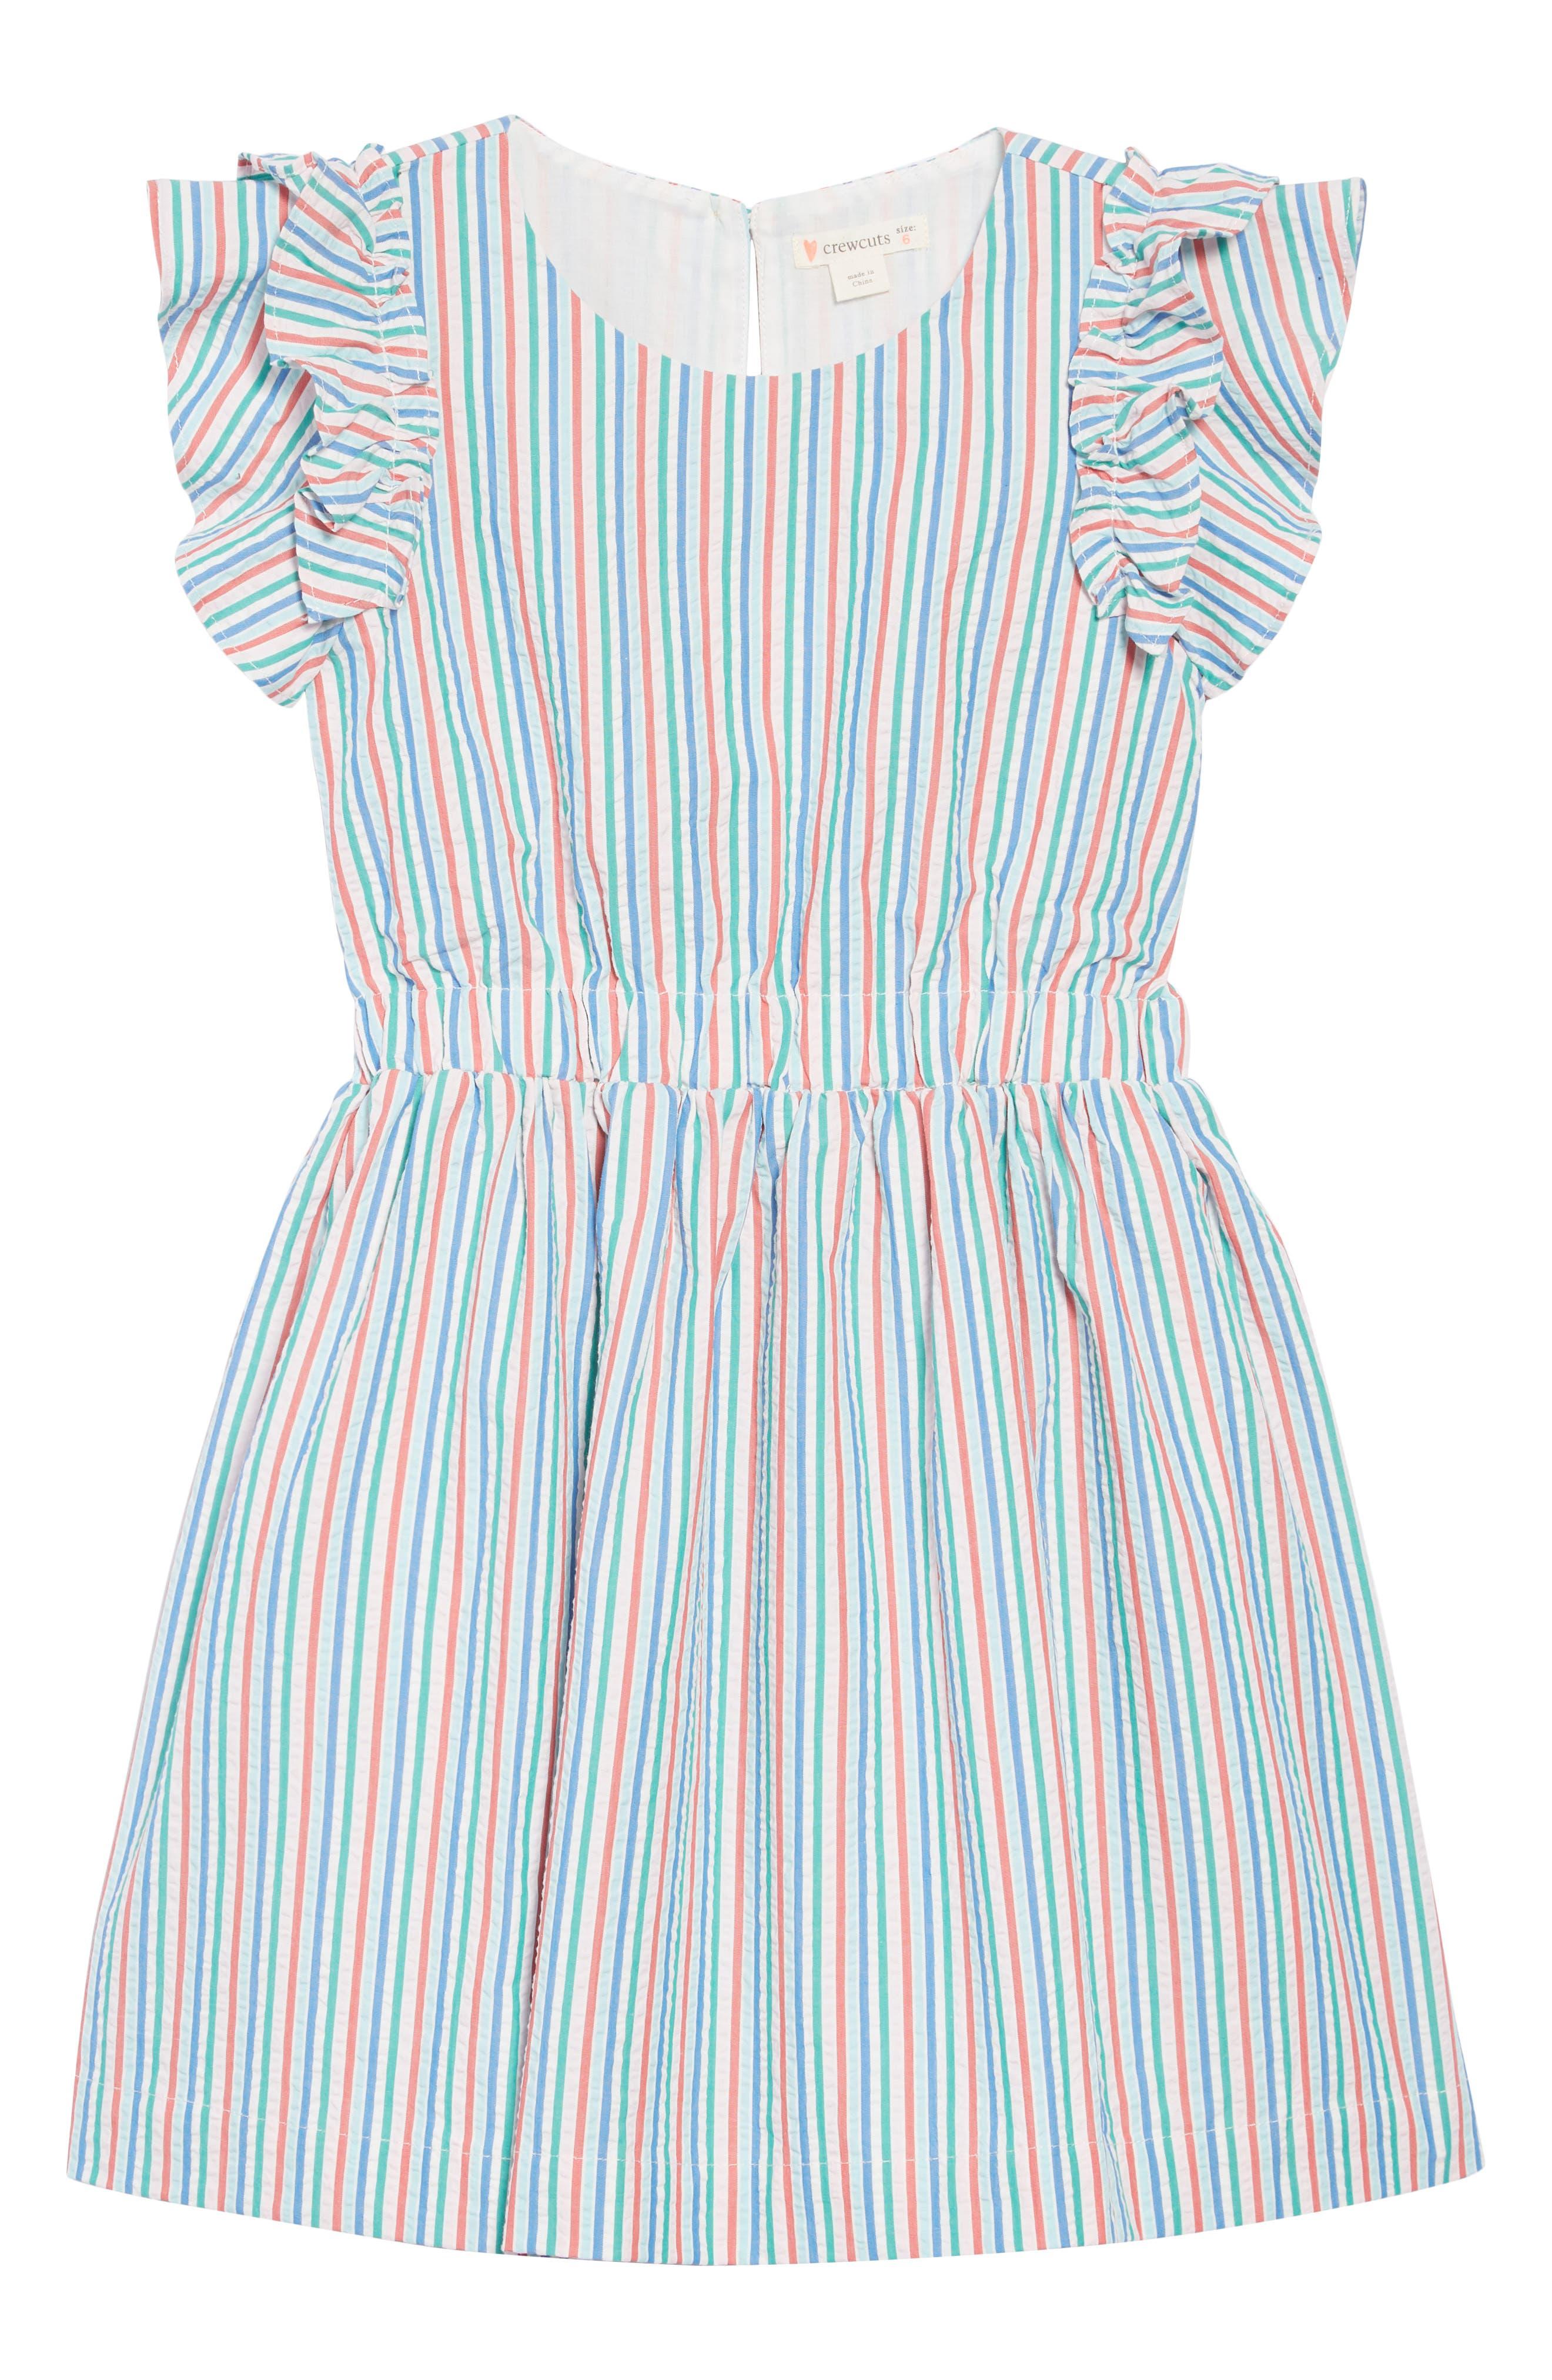 CREWCUTS BY J.CREW Kate Ruffle Seersucker Dress, Main, color, IVORY BLUE MULTI